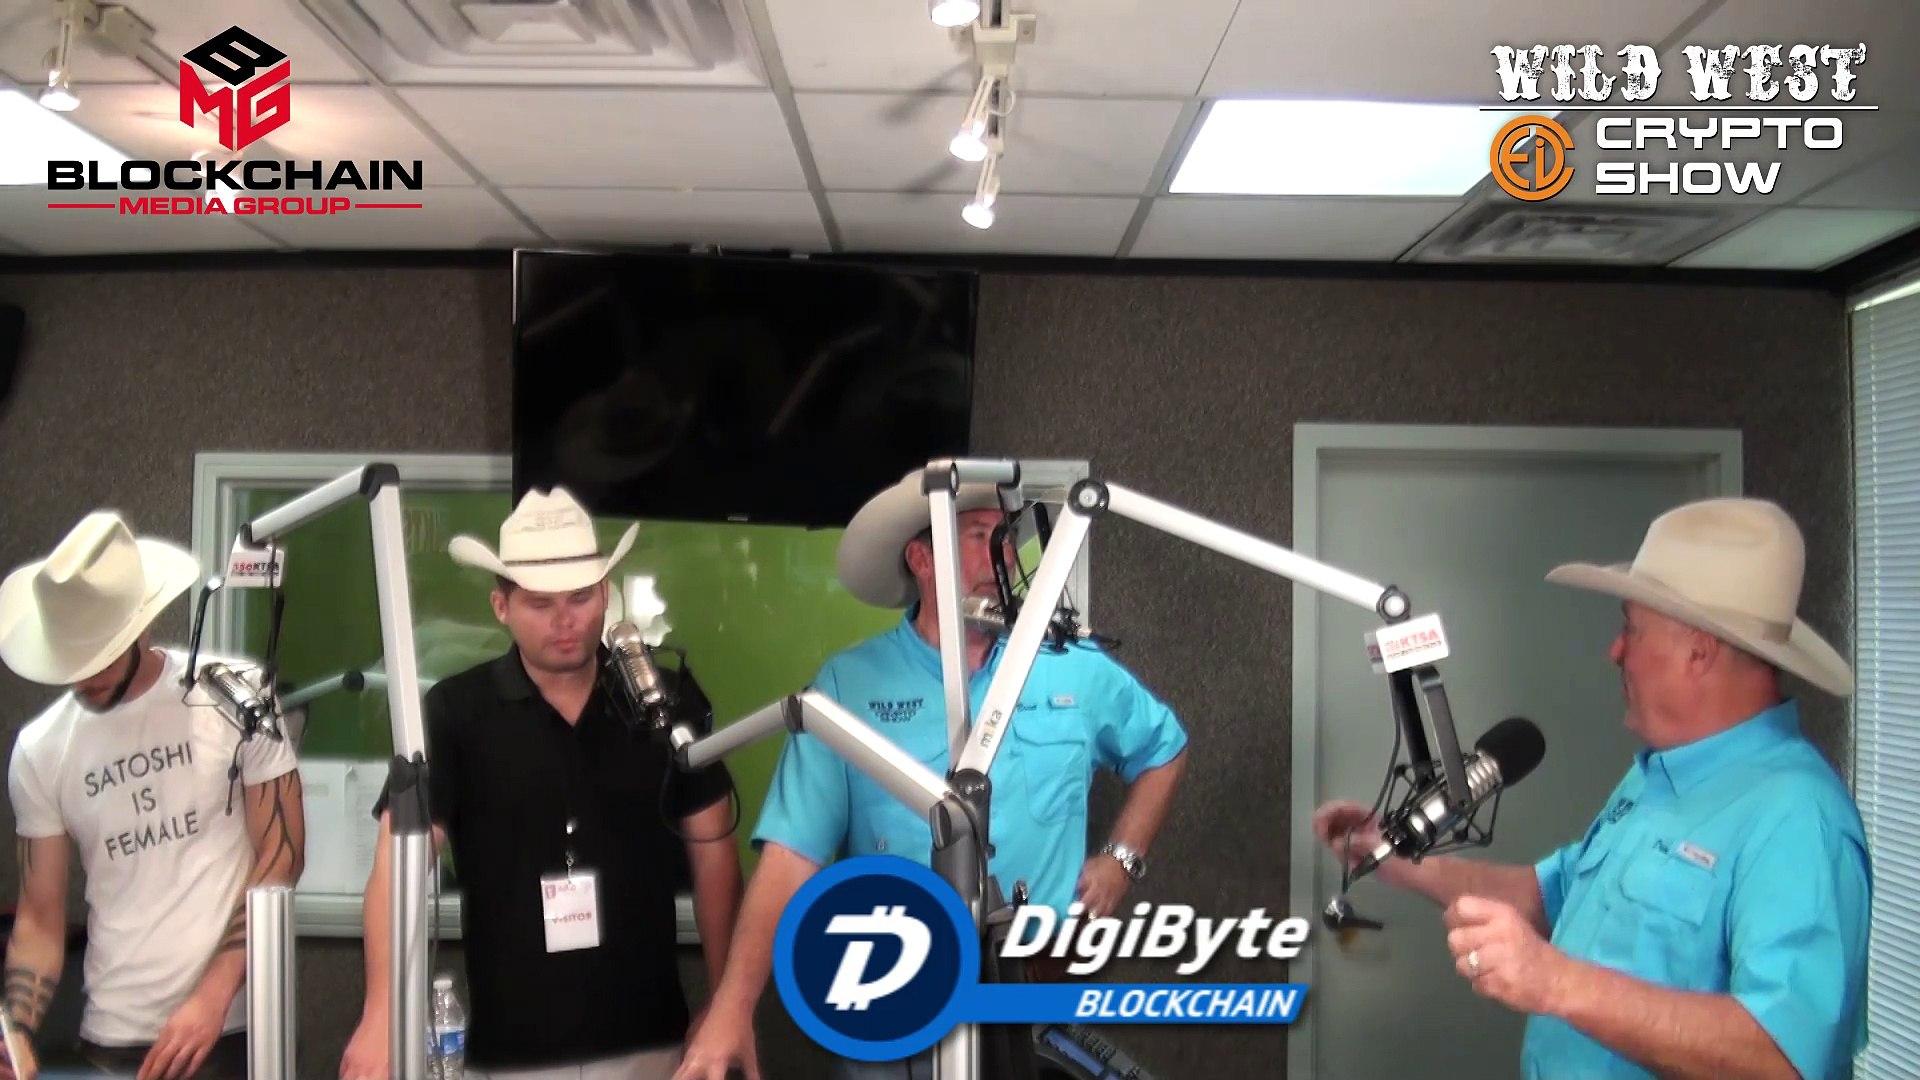 Wild West Crypto Show Episode #25 Crypto Dinosaurs – Hour 2